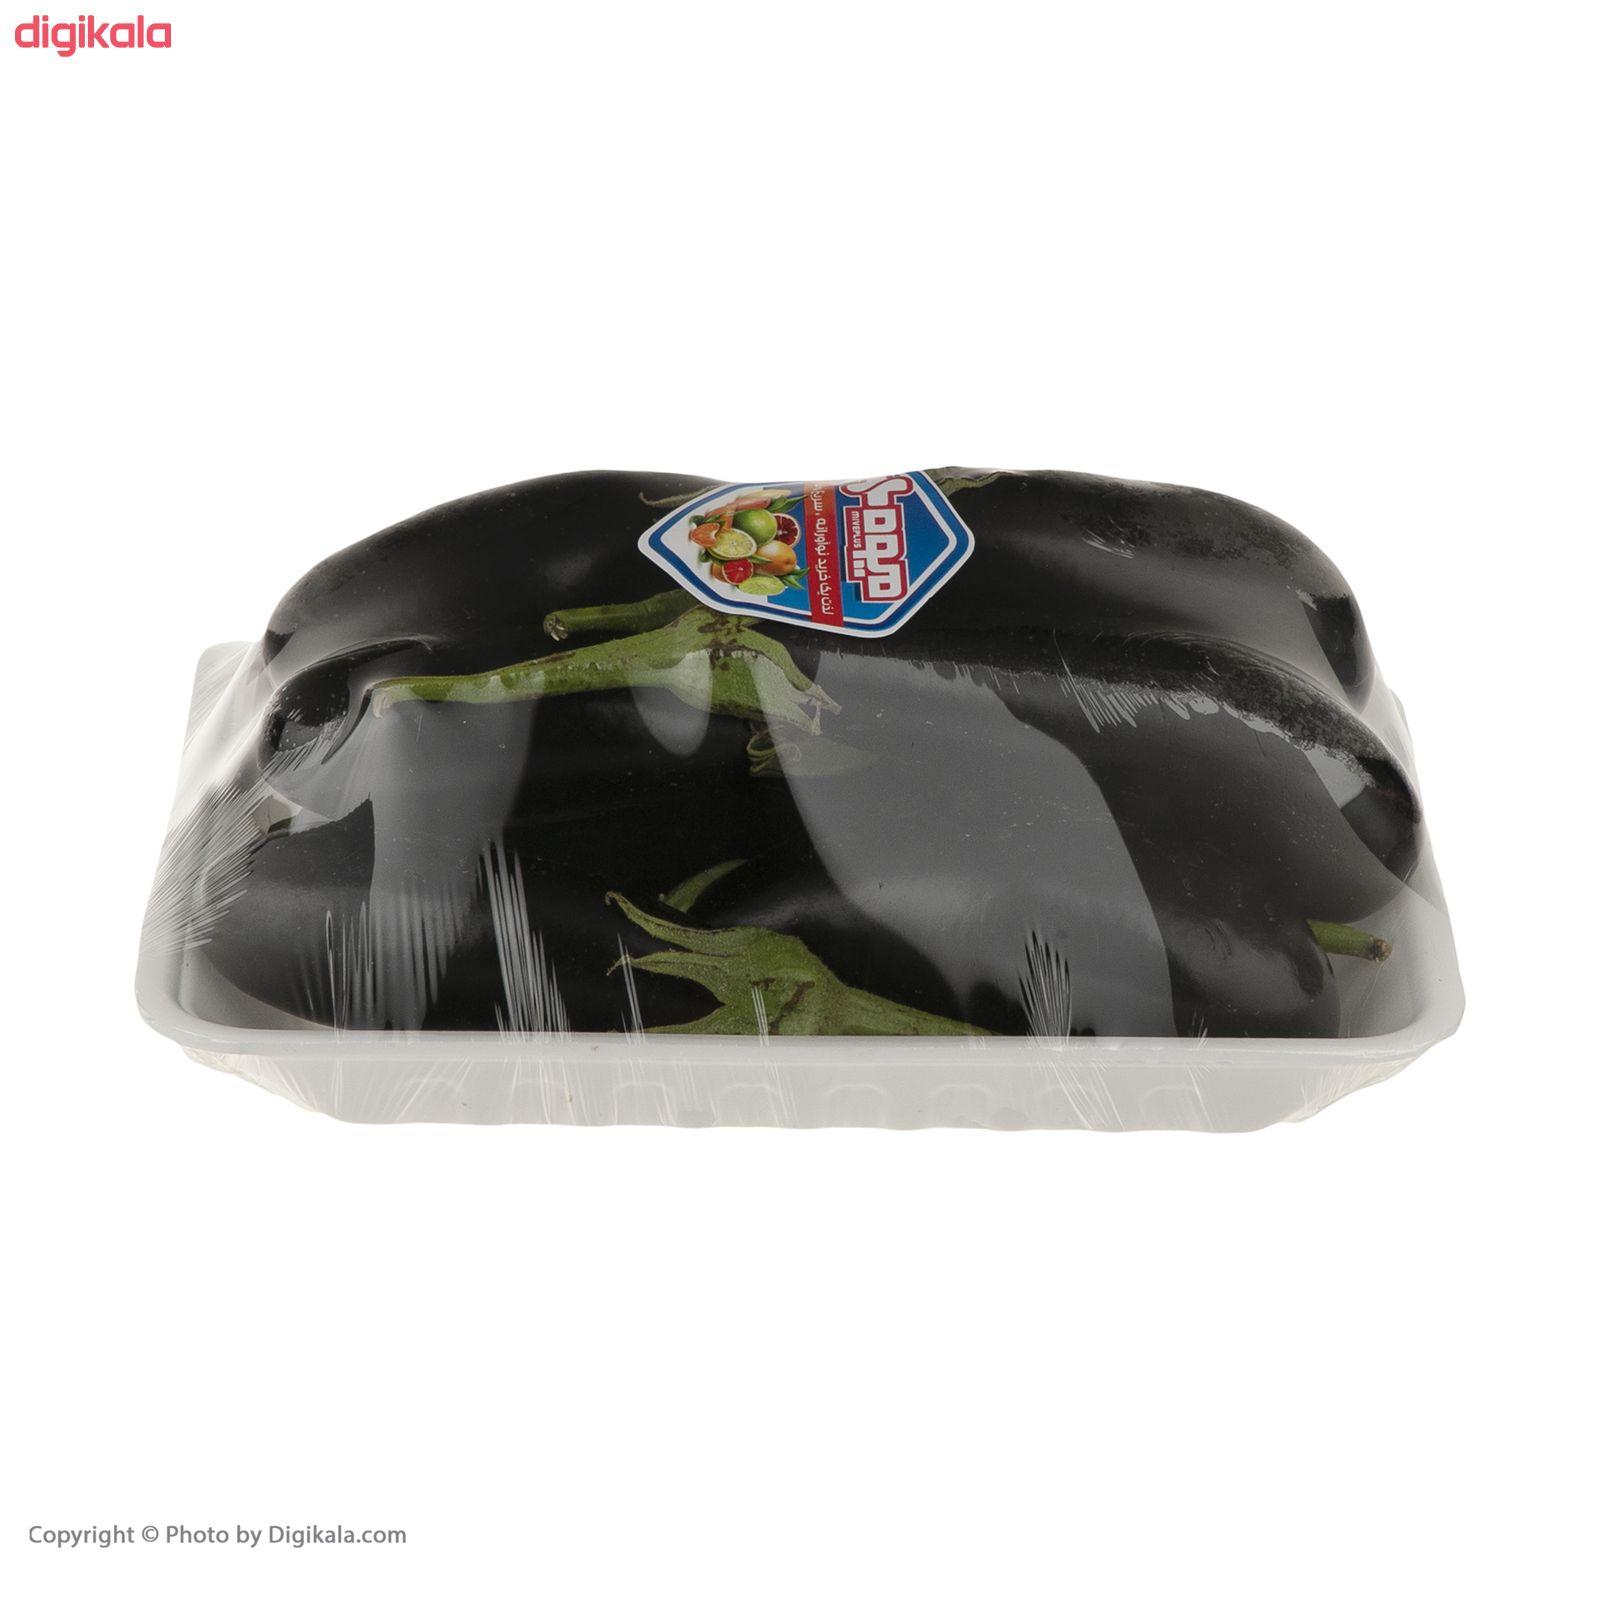 بادمجان میوه پلاس - 1 کیلوگرم main 1 2